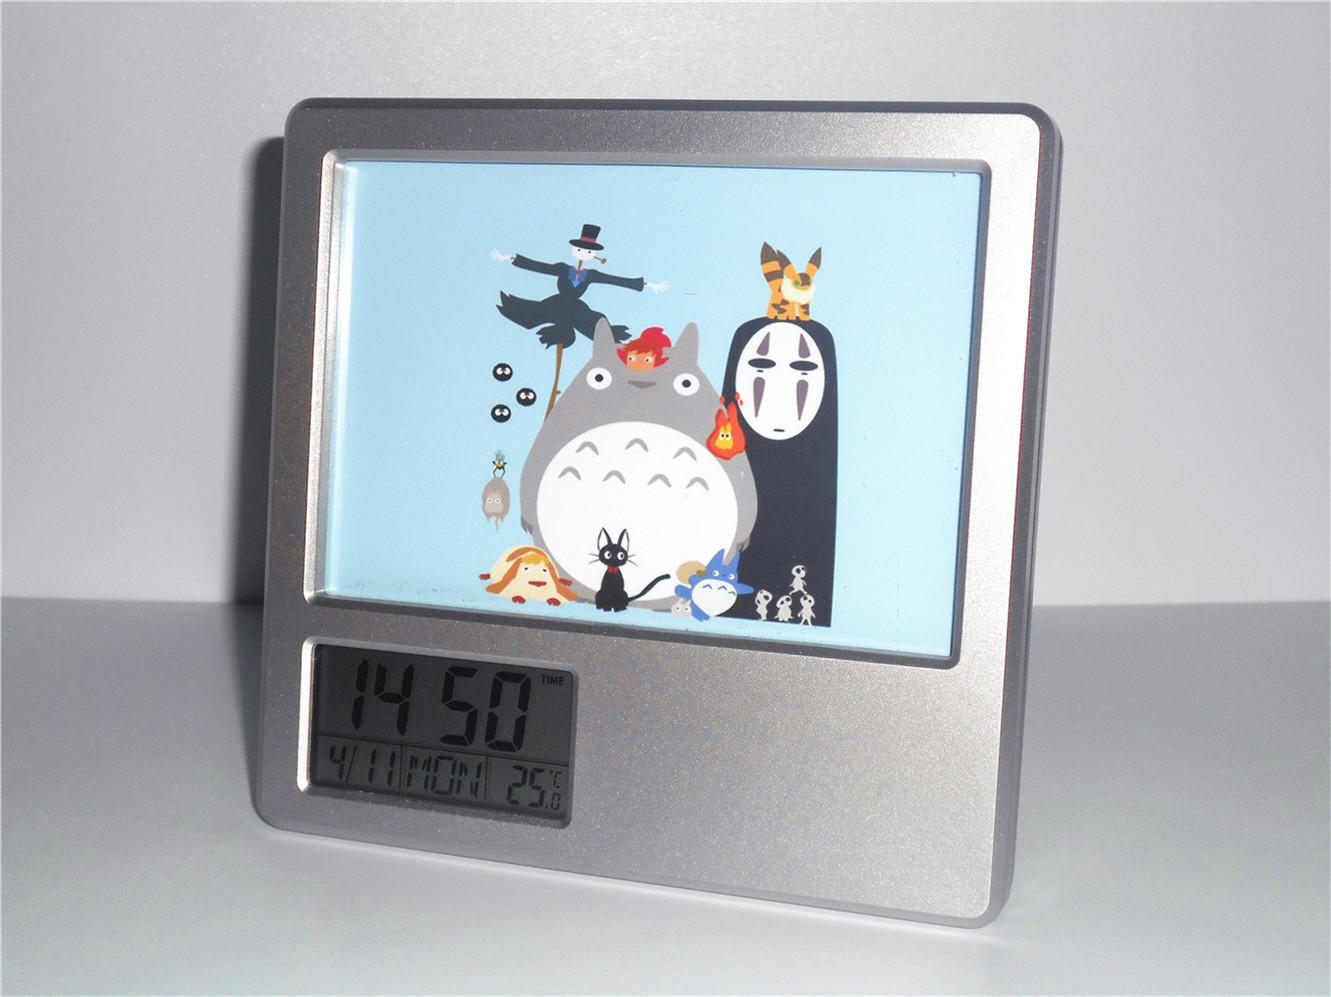 Creative Digital Calendar 2017 new totoro ponyo spirited away creative digital alarm clock